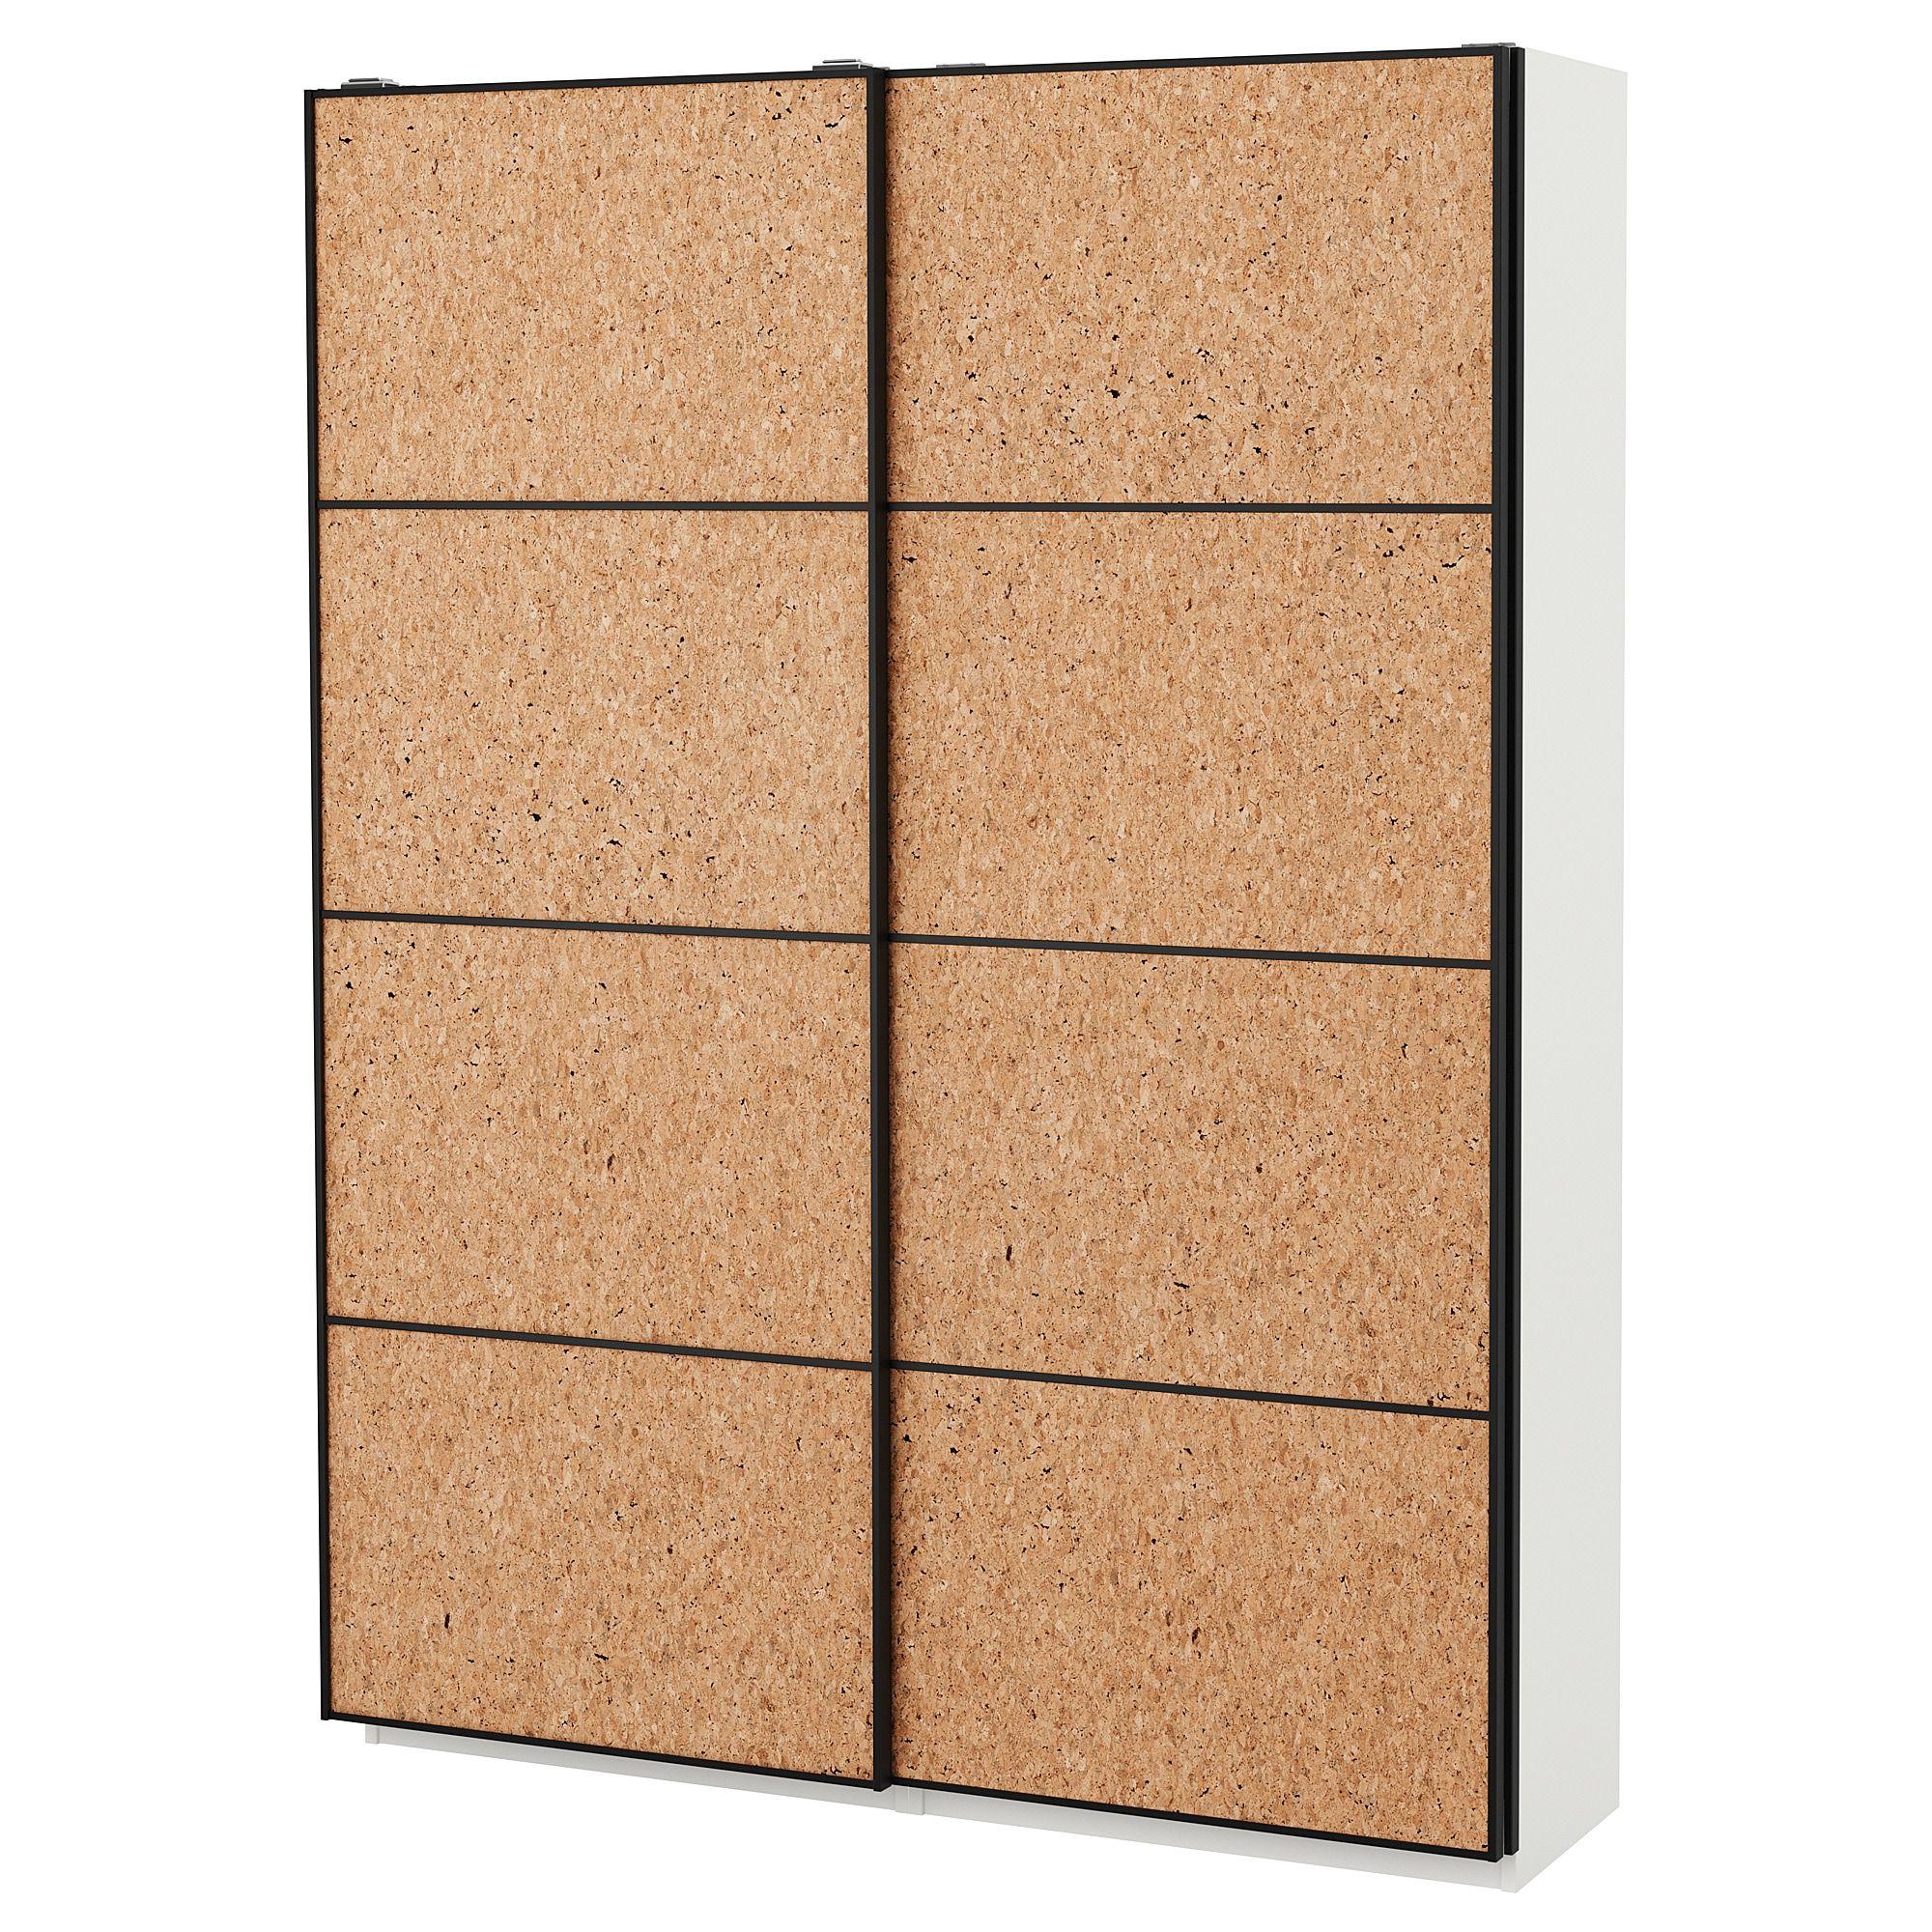 Panneau En Liège Ikea kirkenes 4 panels for sliding door frame - cork veneer 29 1